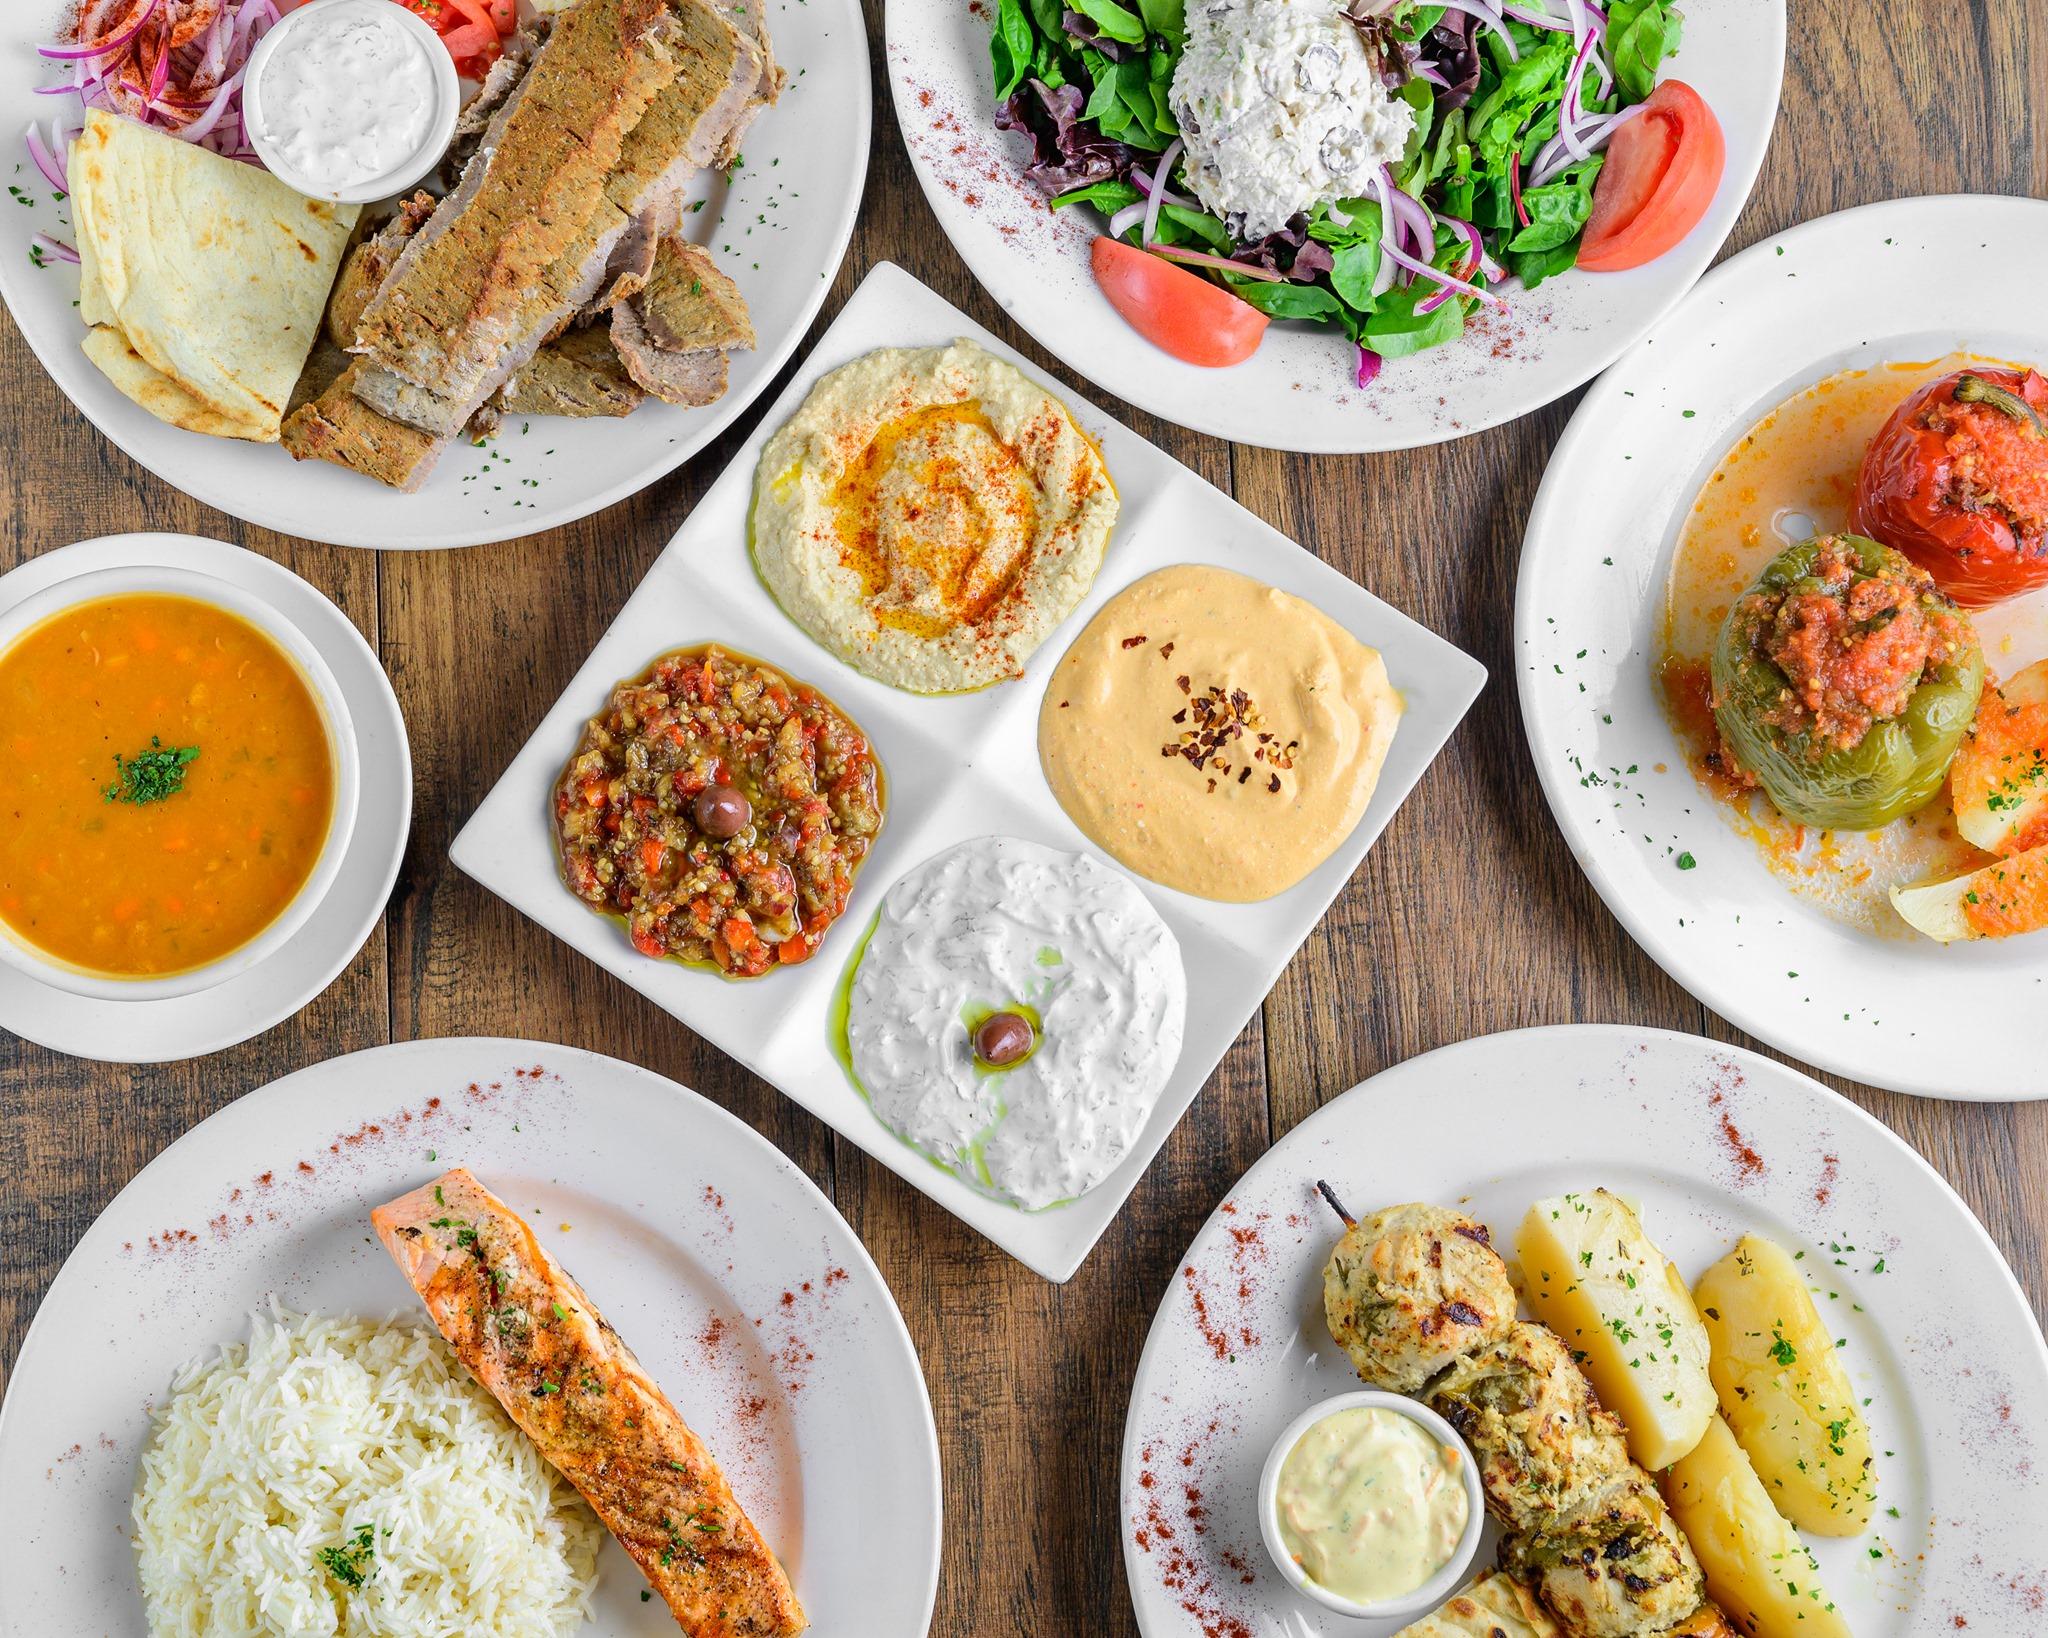 Pega Grill – Greek restaurant in Miami